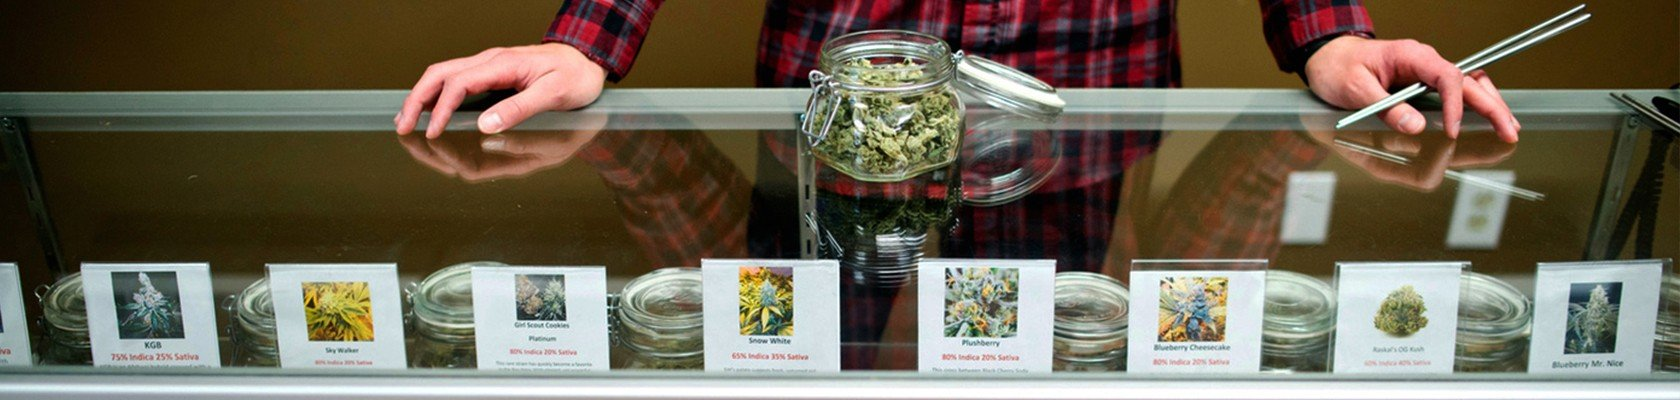 Best Sellers | Best Weed Indica, Sativa, Hybrid Strains & Edibles